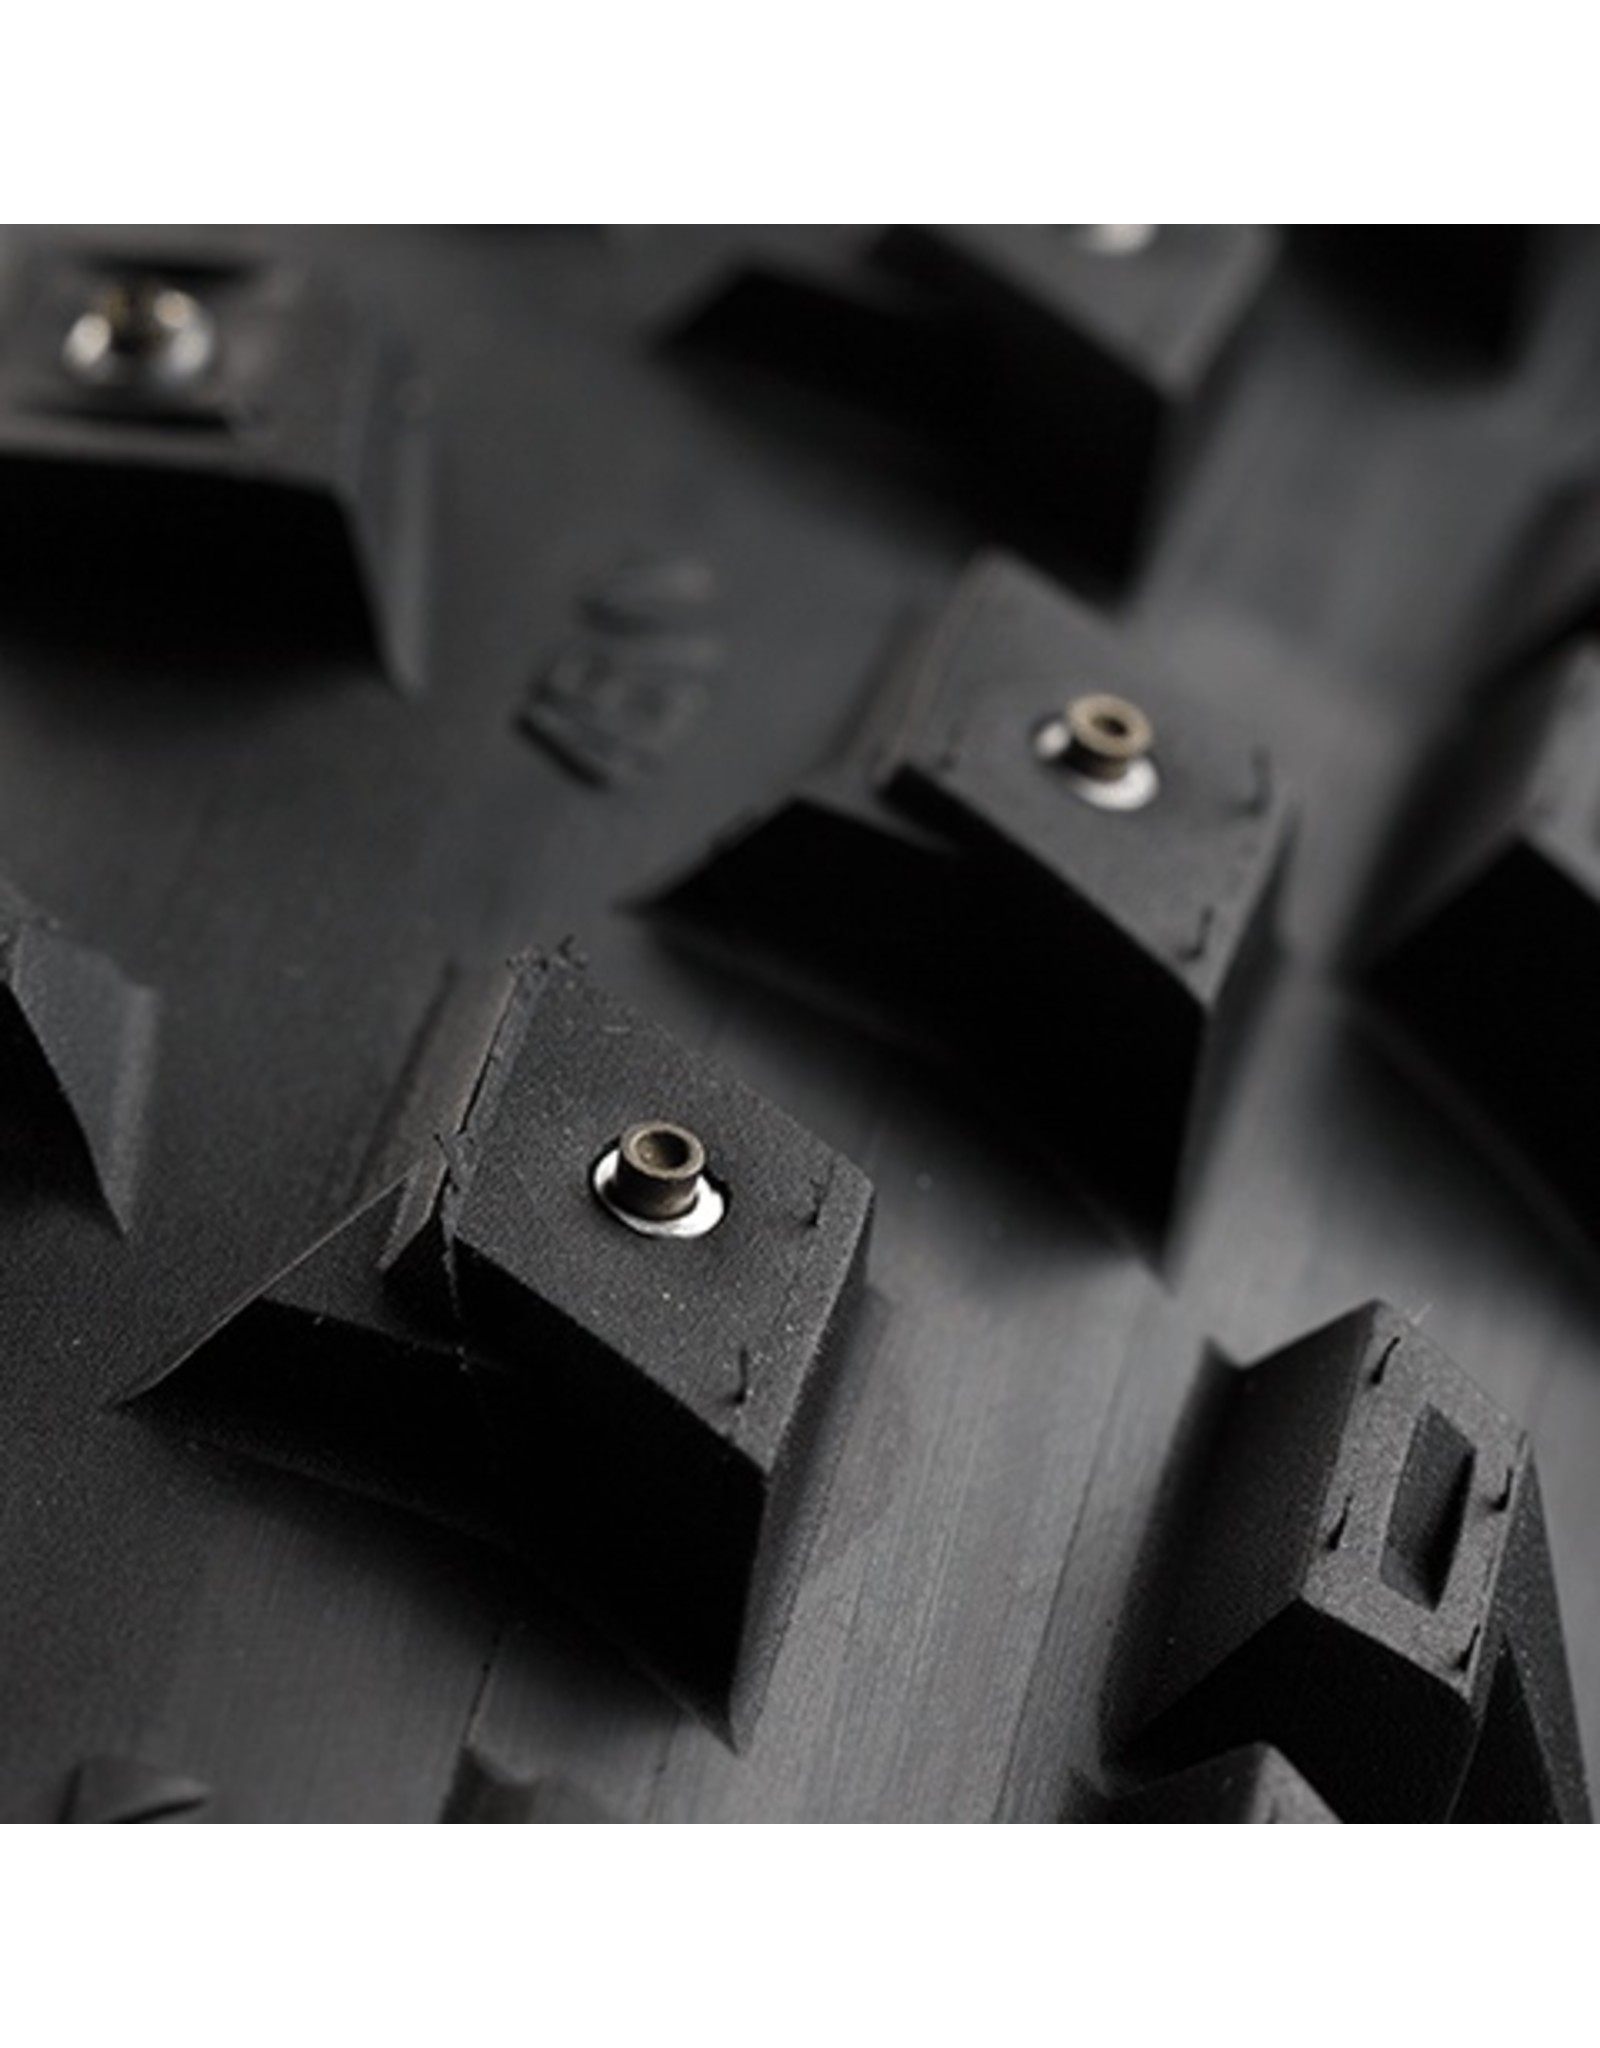 45Nrth Dillinger 5 120tpi 26x4.6 ( 258 crampons concaves)